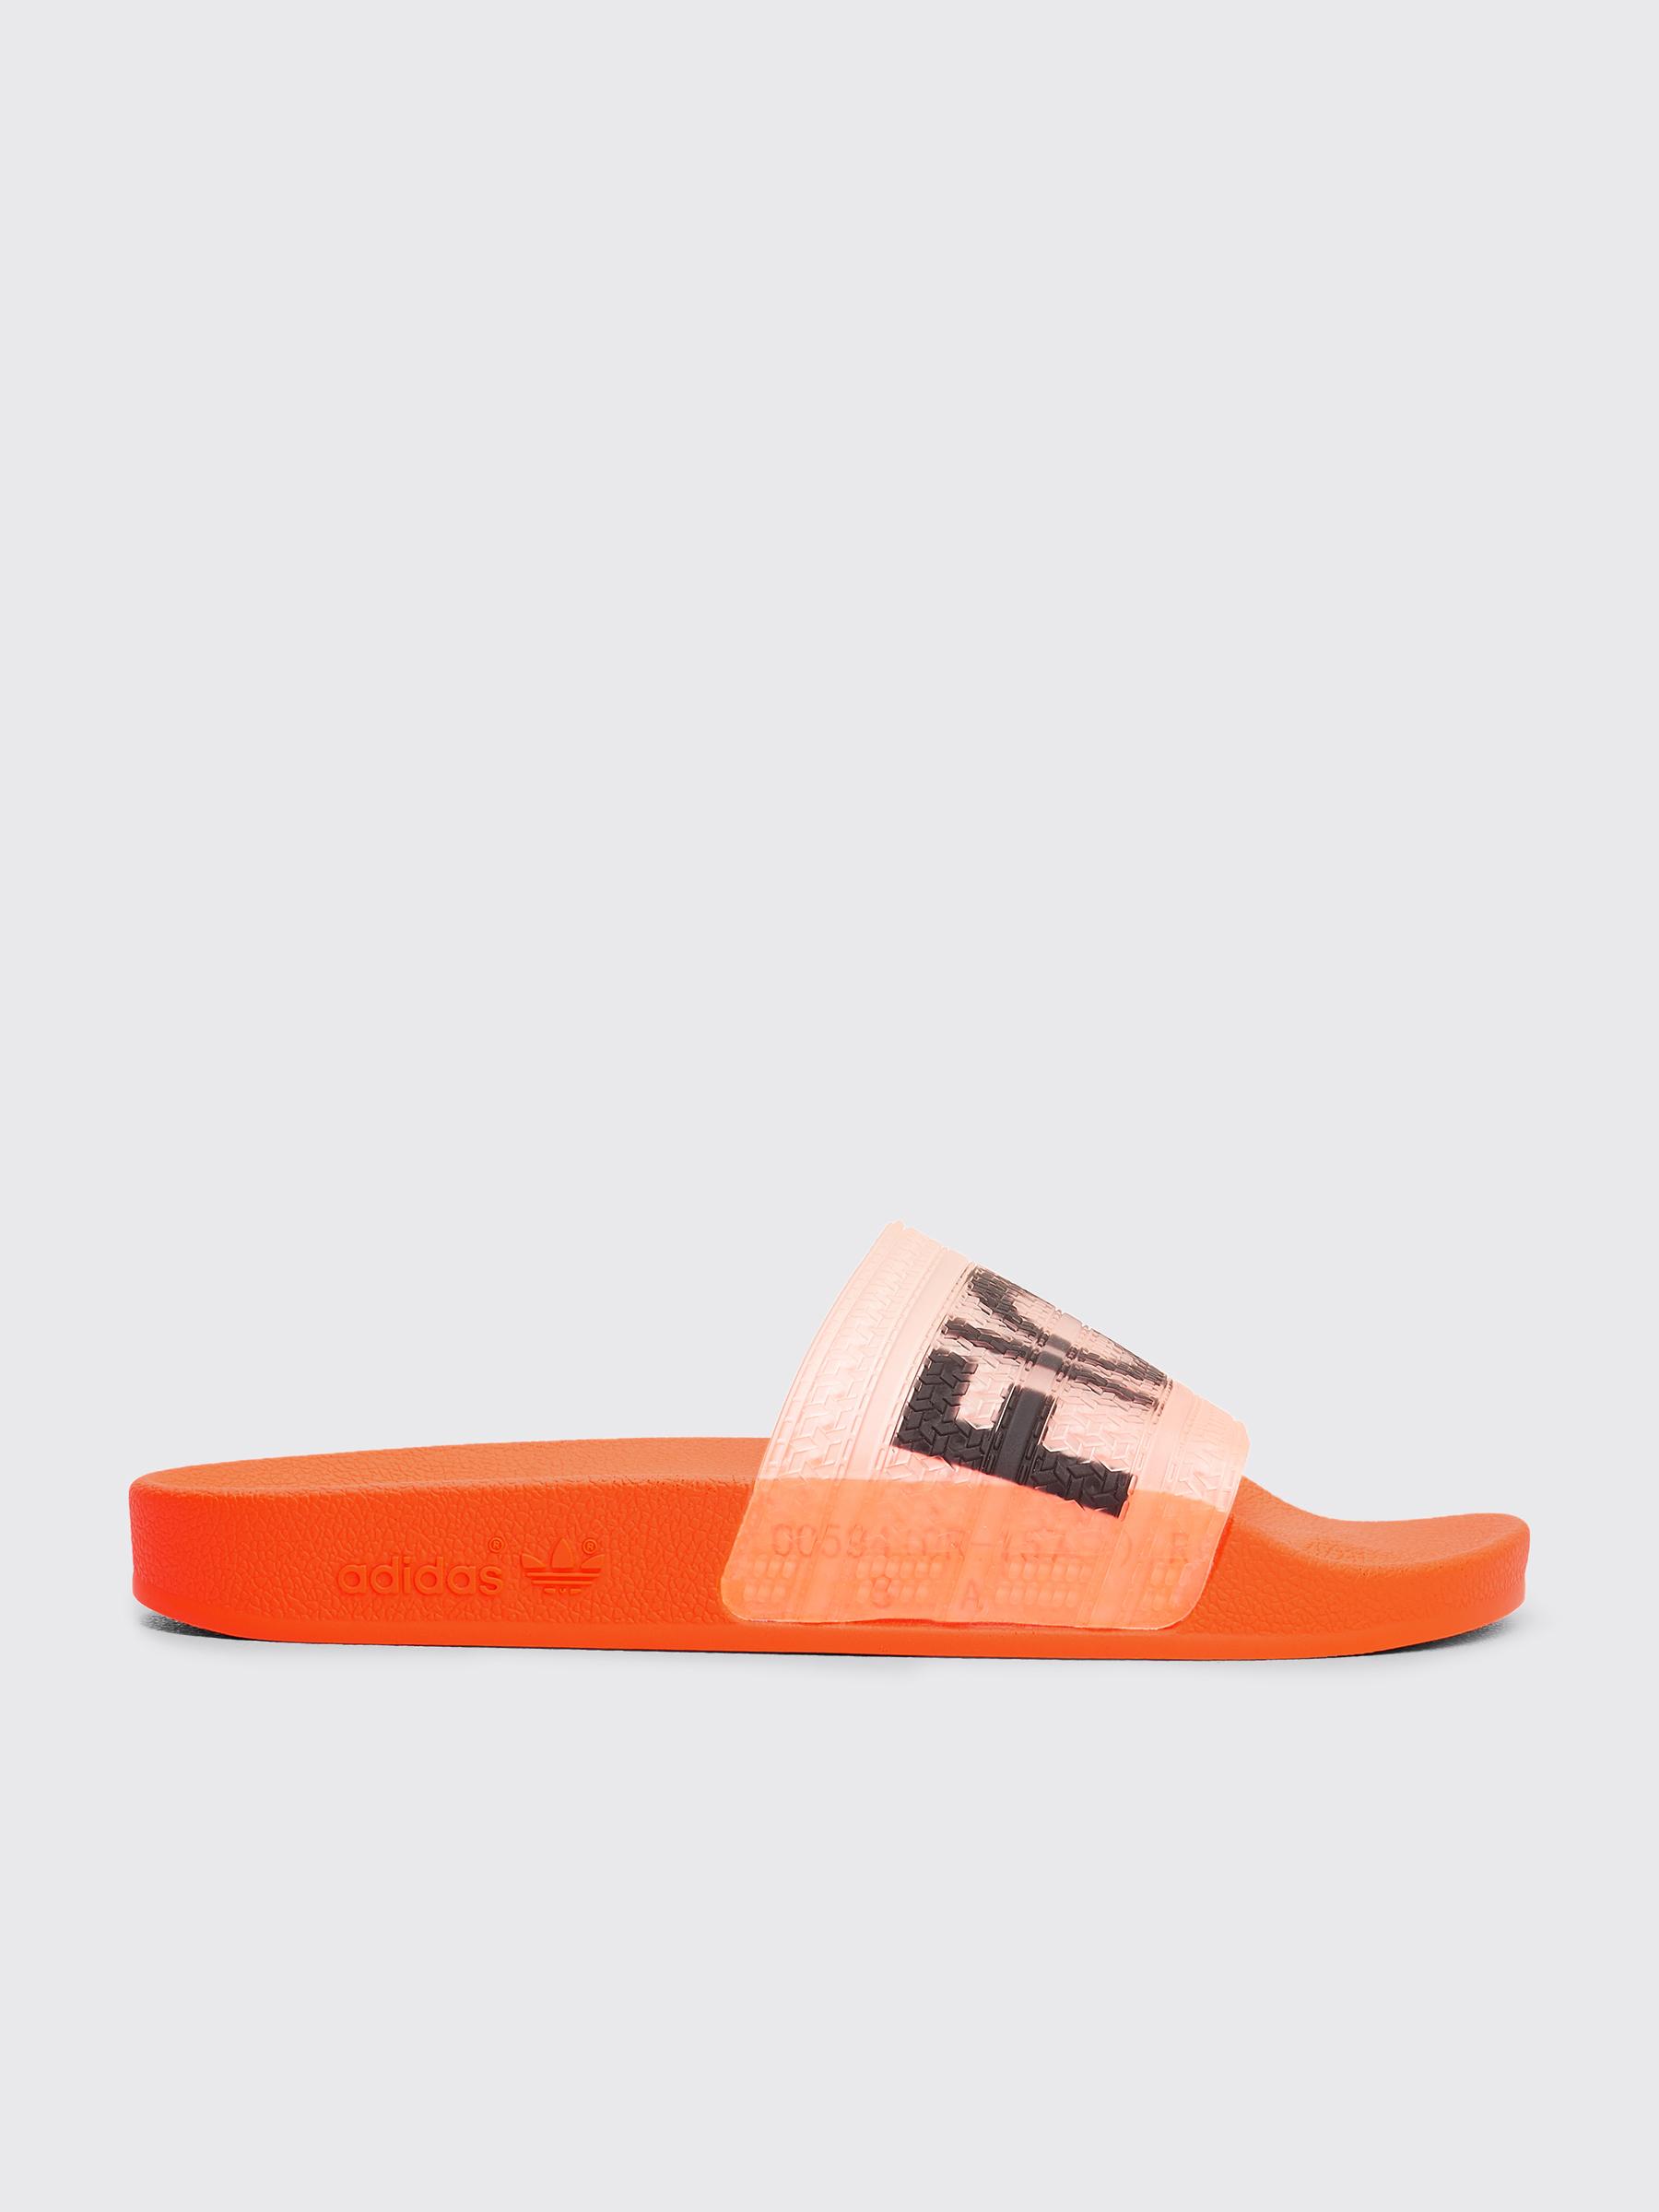 08078738b99 Très Bien - adidas x Fiorucci Adilette Solar Orange